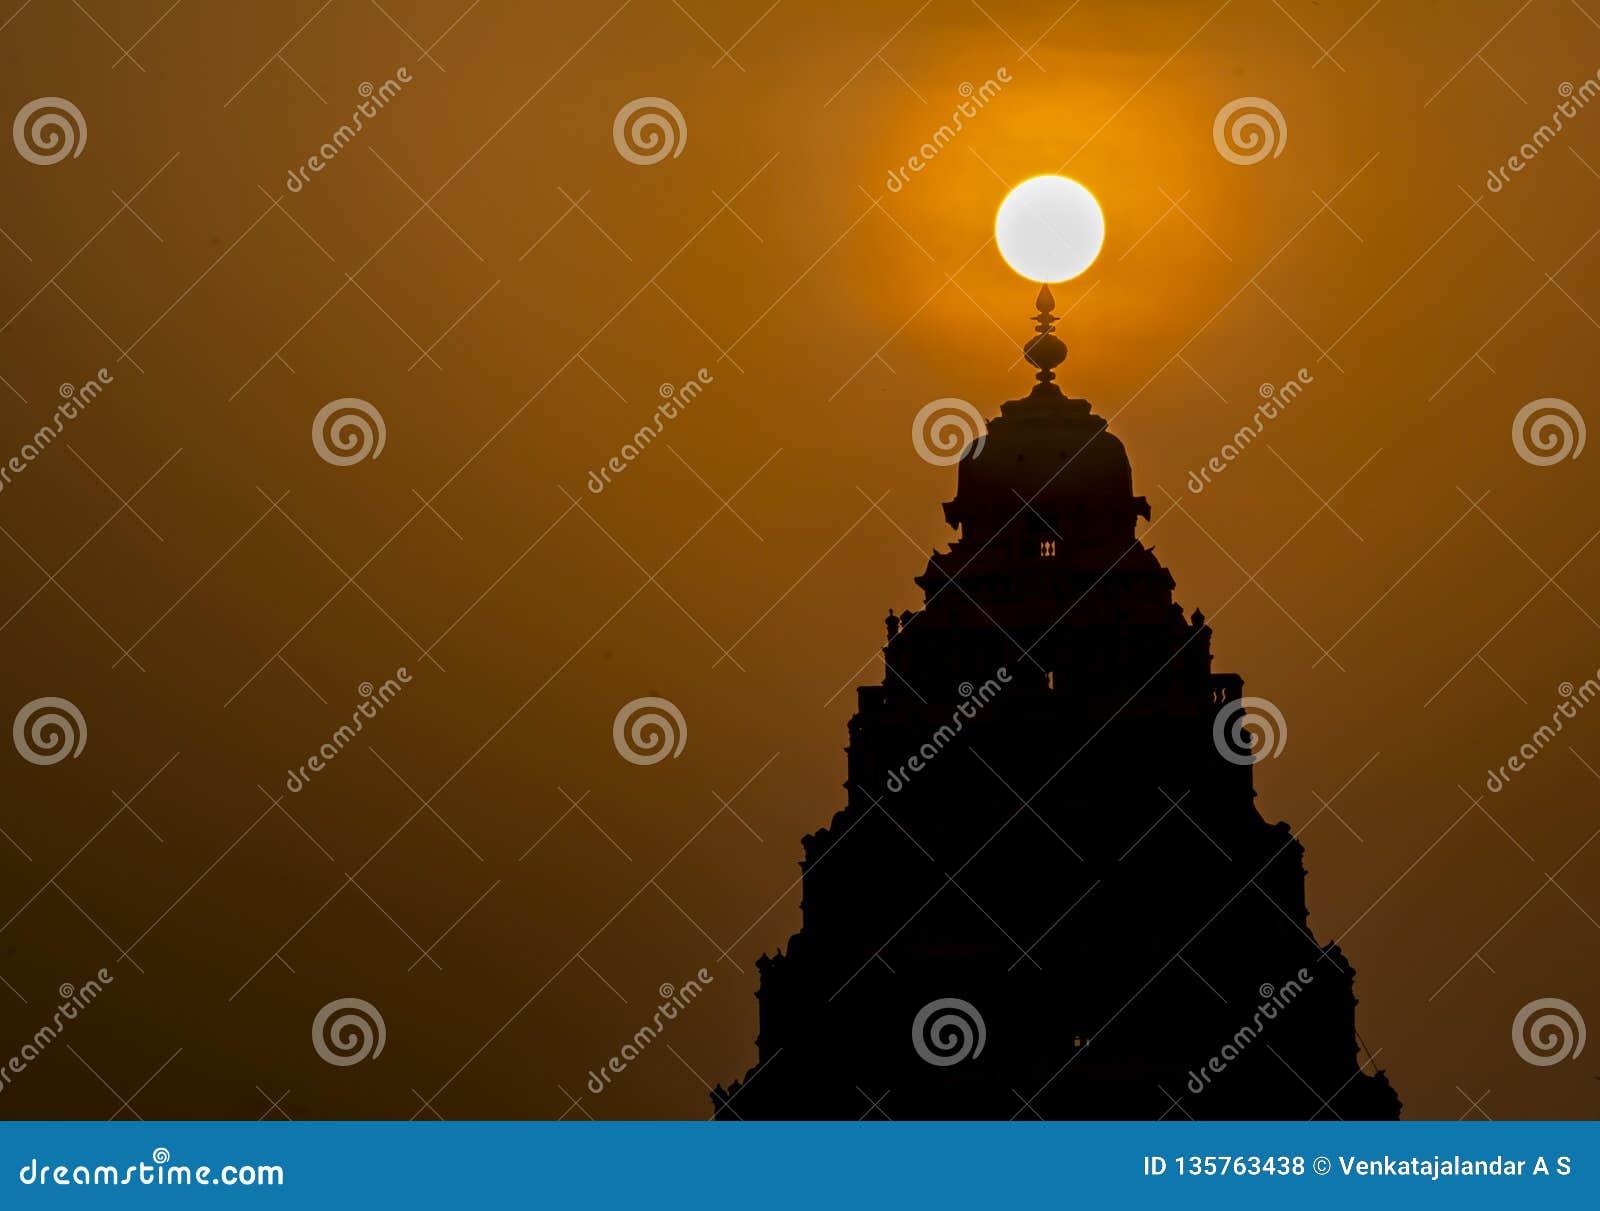 Sunrise: Natural Light decoration over a Hindu temple.